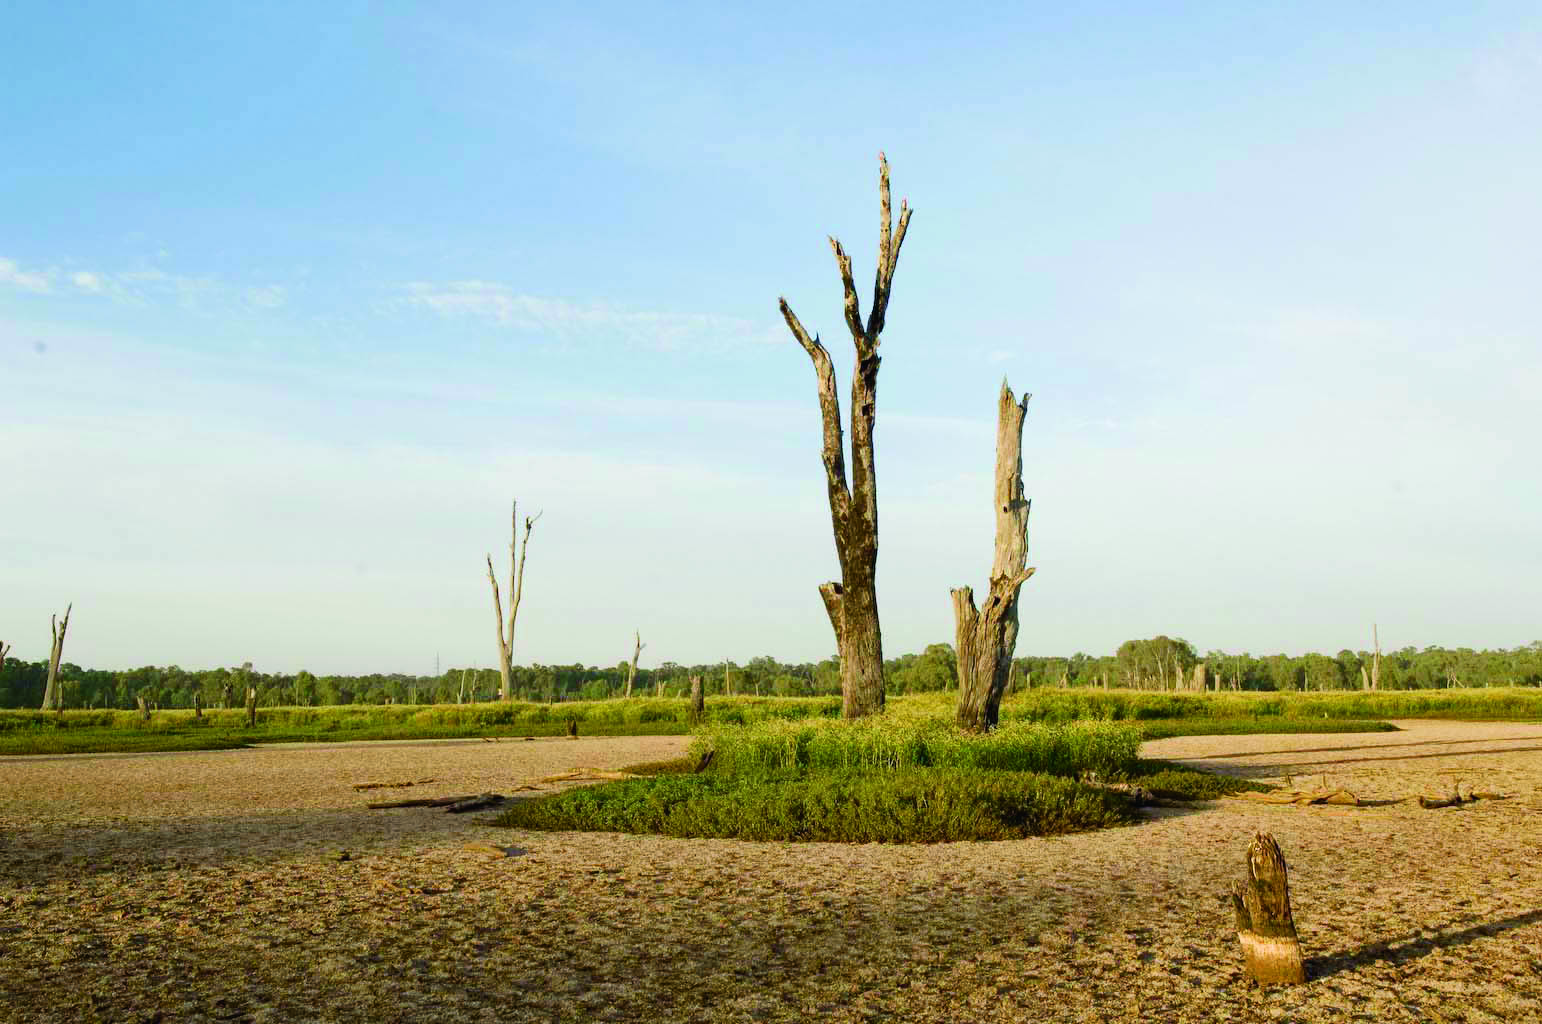 Australasia Riverprize – 2001